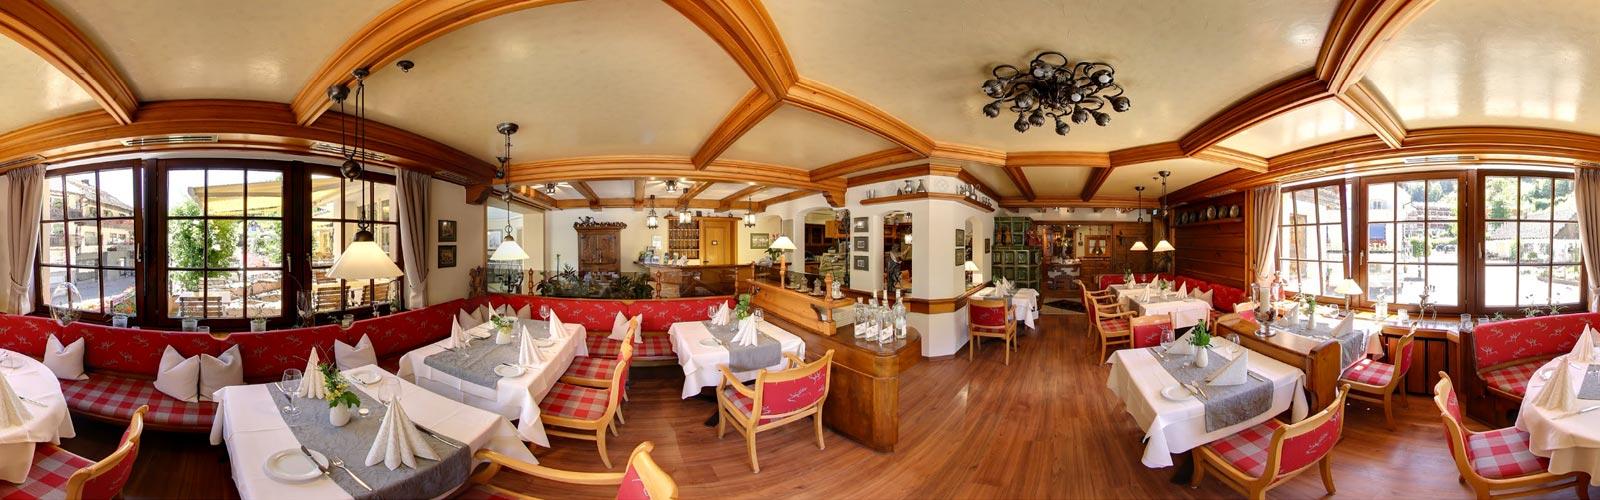 Adlerbad-Flair-Hotel-Restaurant-1600x500px